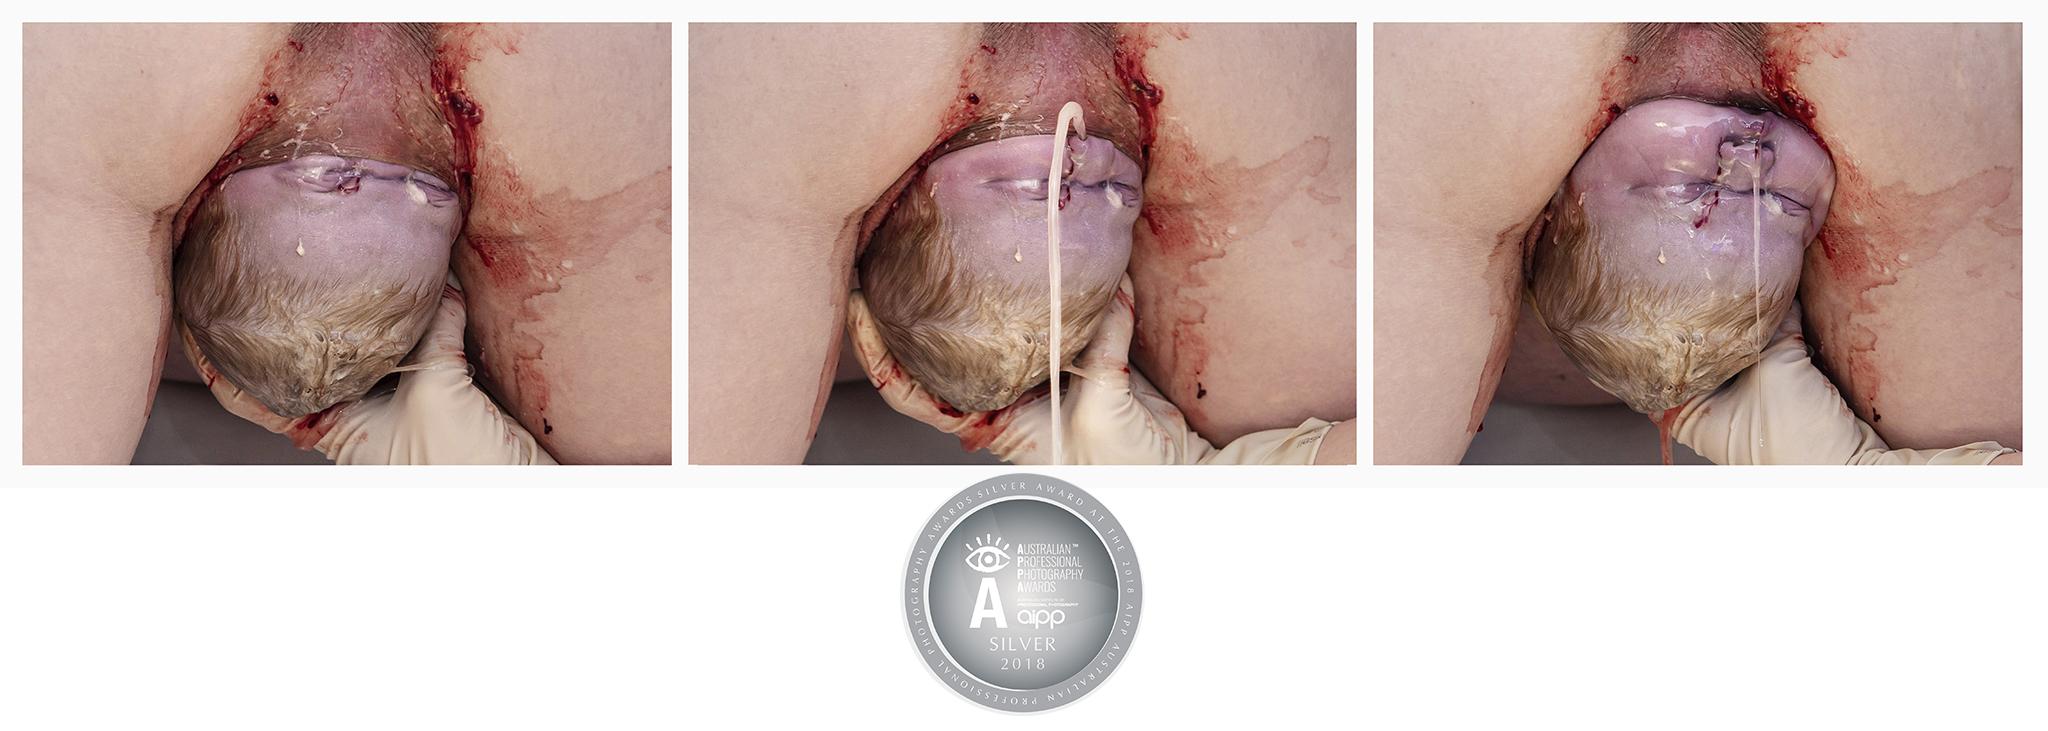 APPA Silver Distinction Award